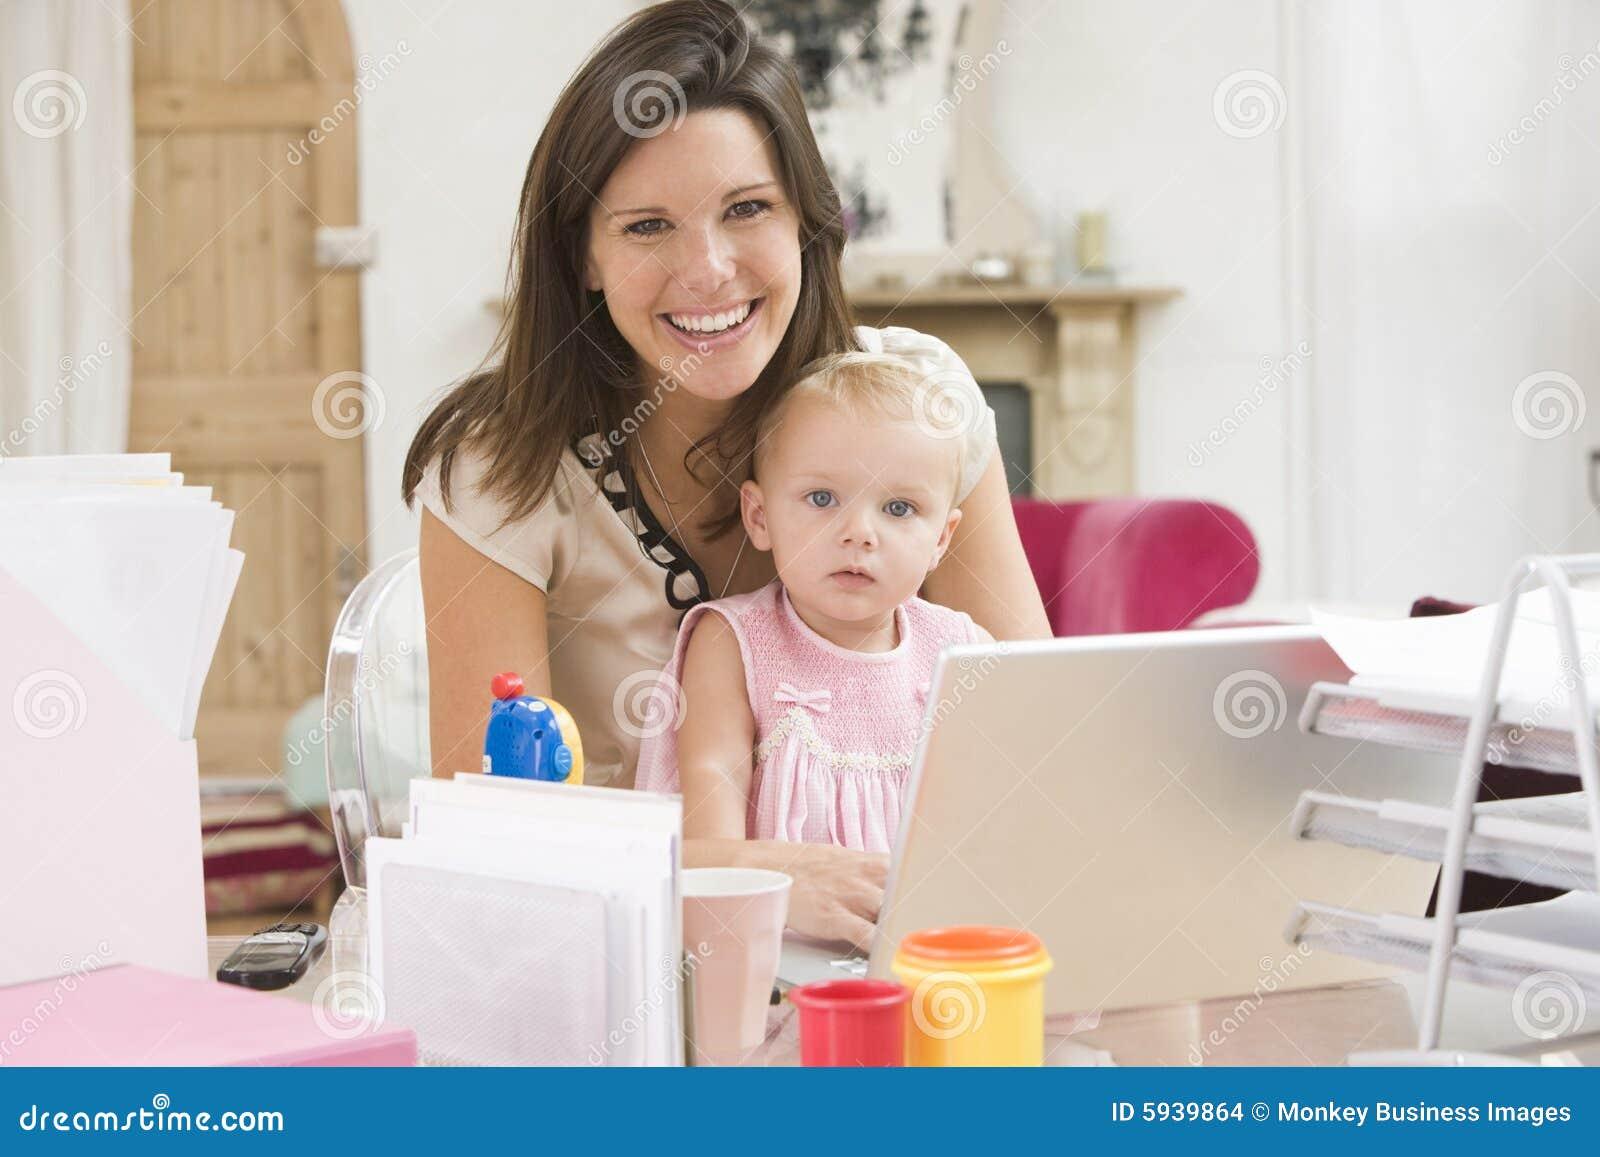 W domu dziecka matki do laptopa